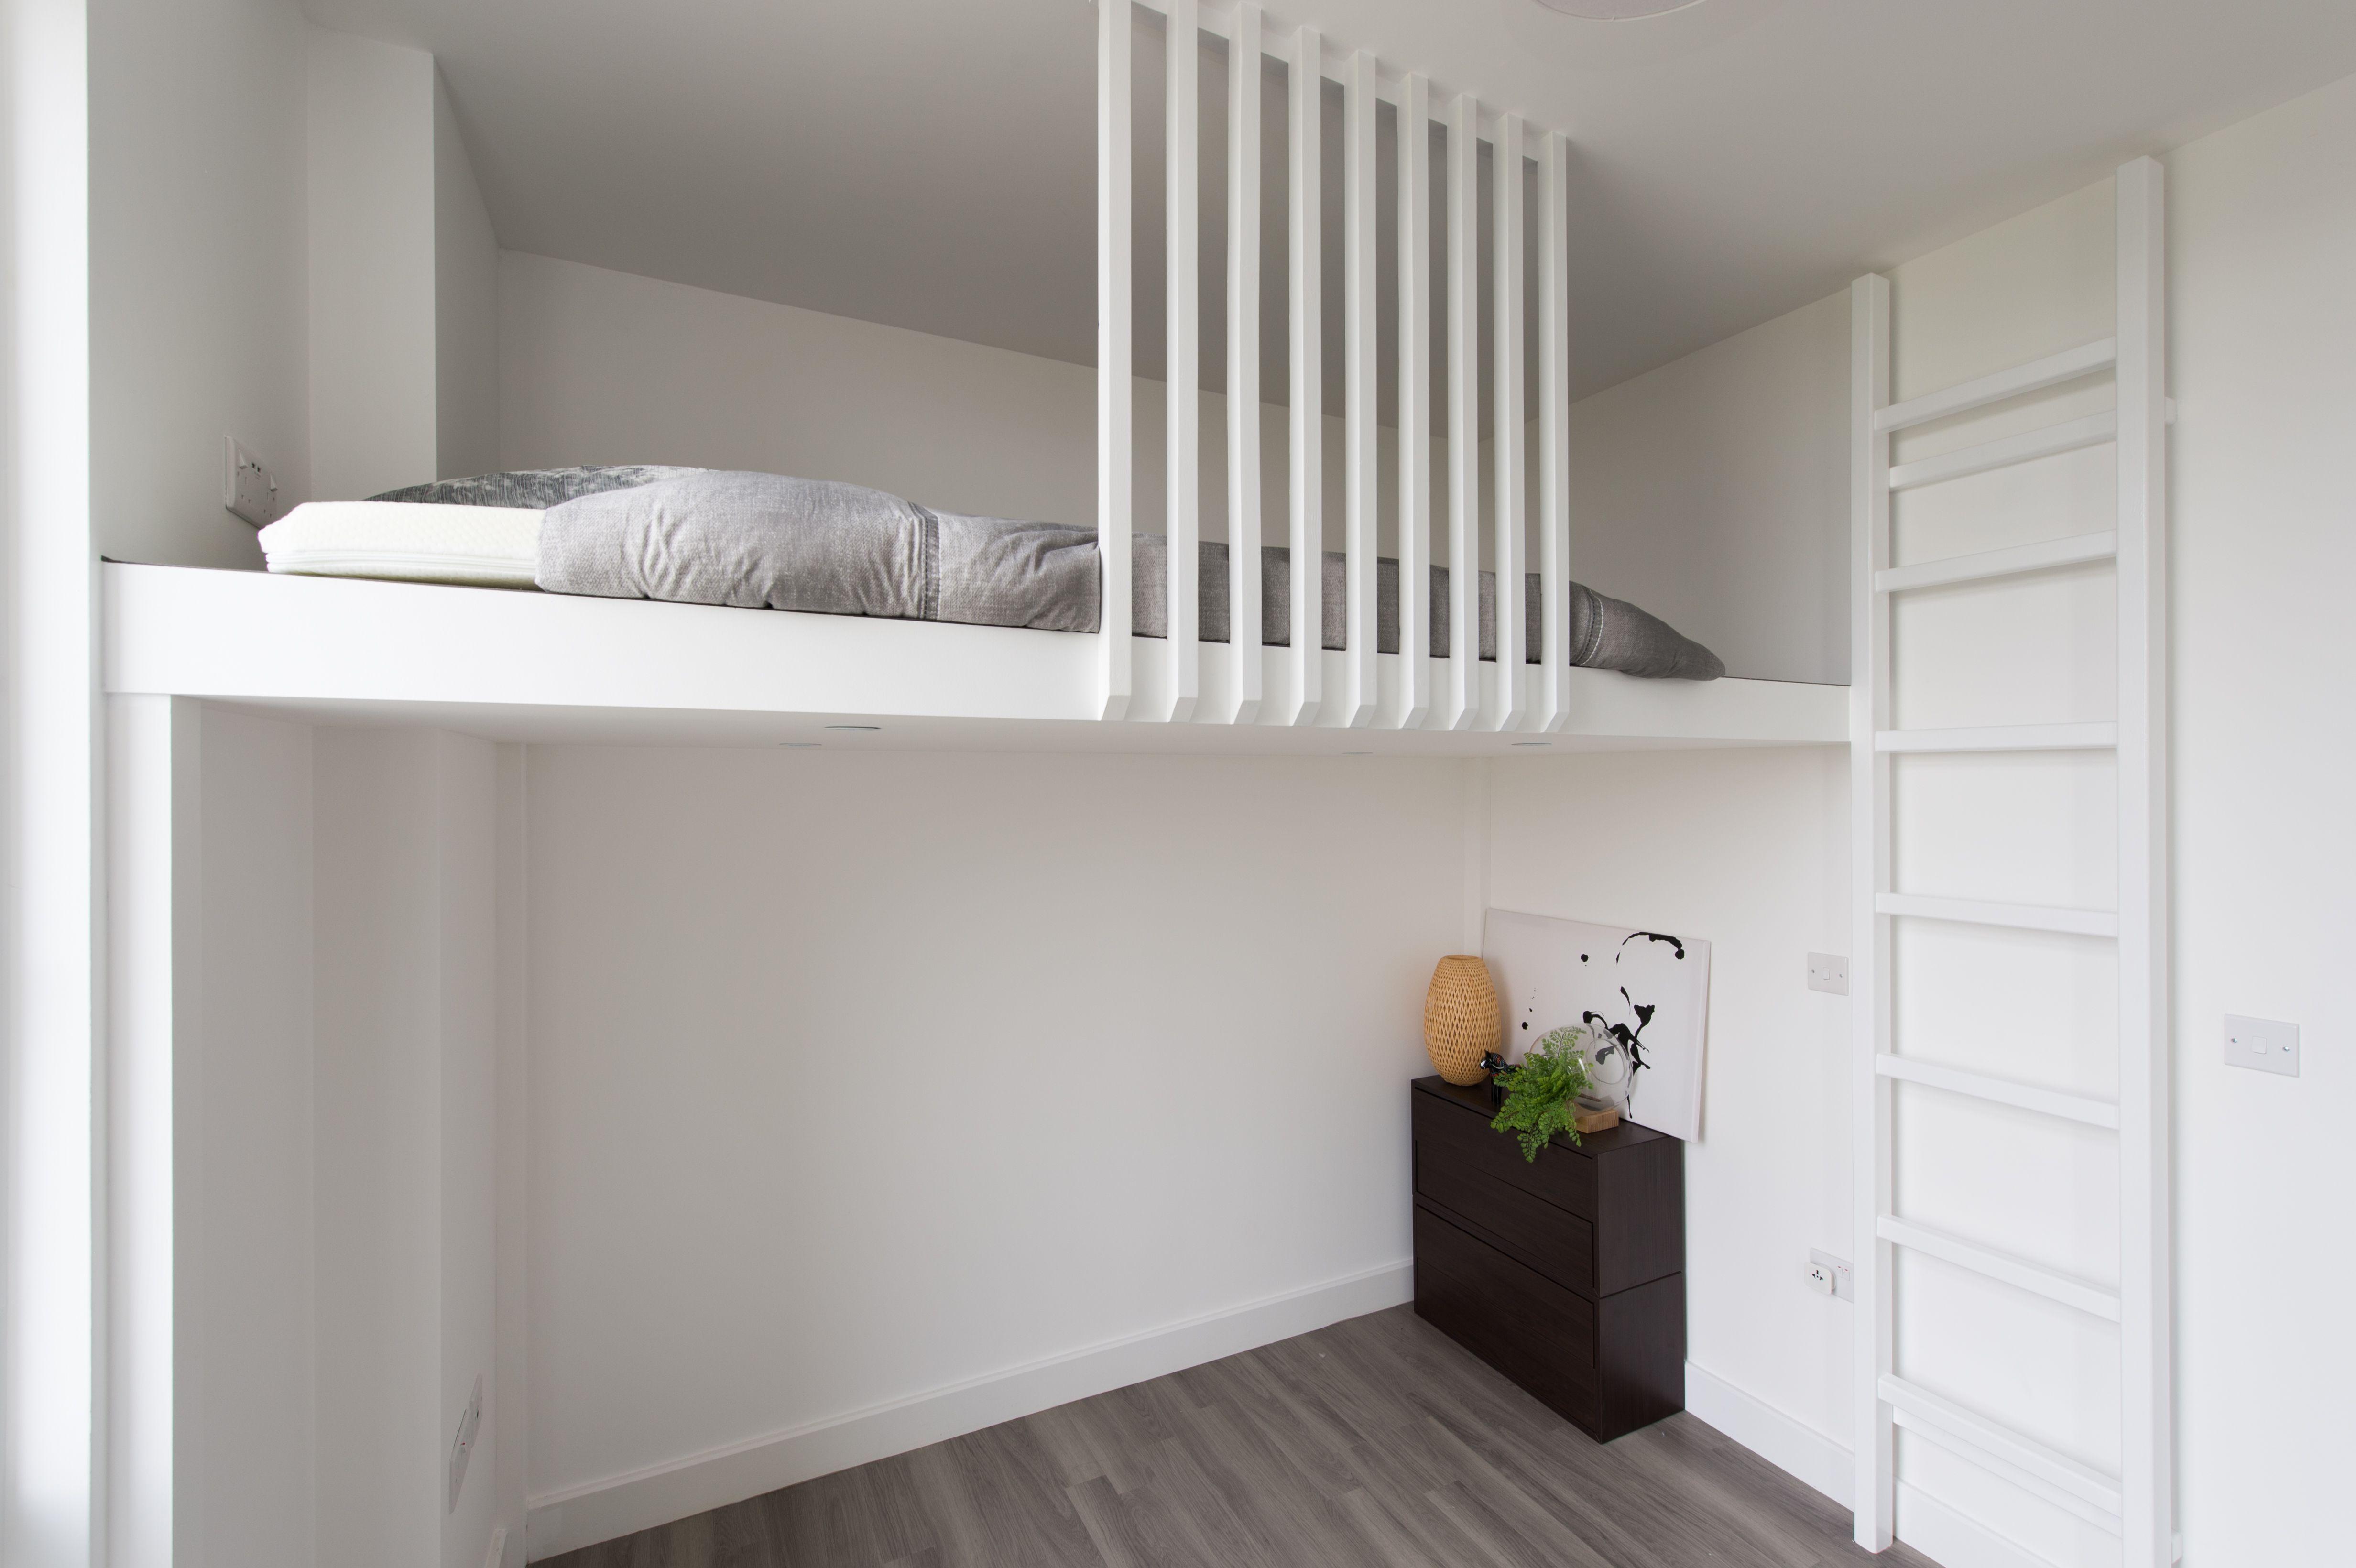 Scandinavian Loft Bespoke Design Compact Living Mezzanine Loft Oak Wood Loft Bed Bes Box Room Bedroom Ideas Small Room Design Small Space Storage Bedroom